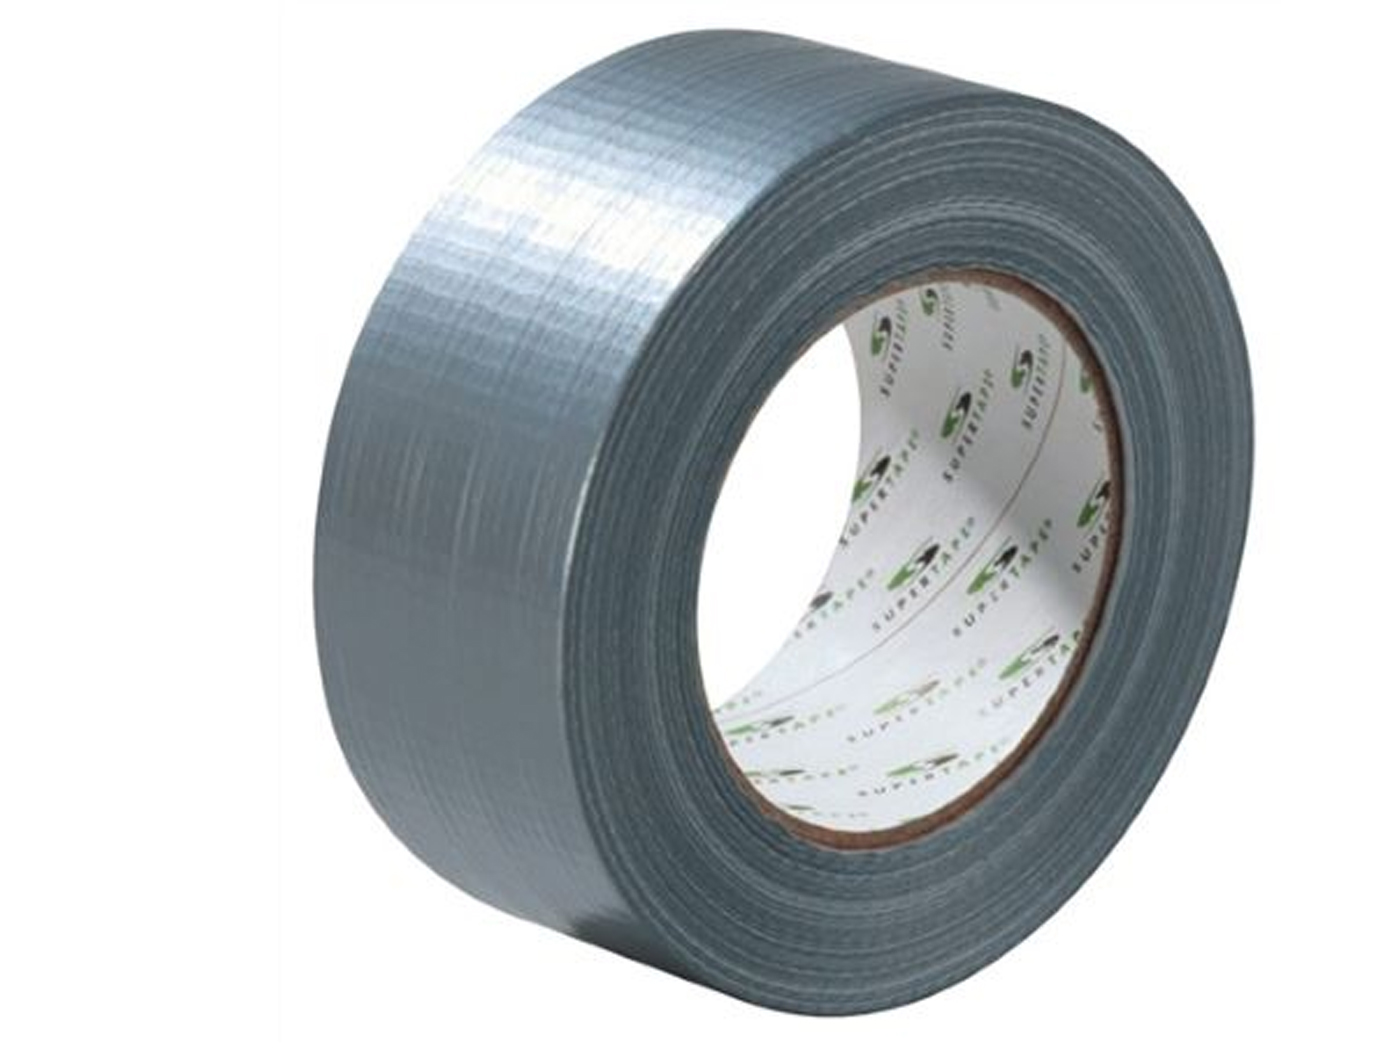 Tape Superduct ST201 zilver | DKMTools - DKM Tools